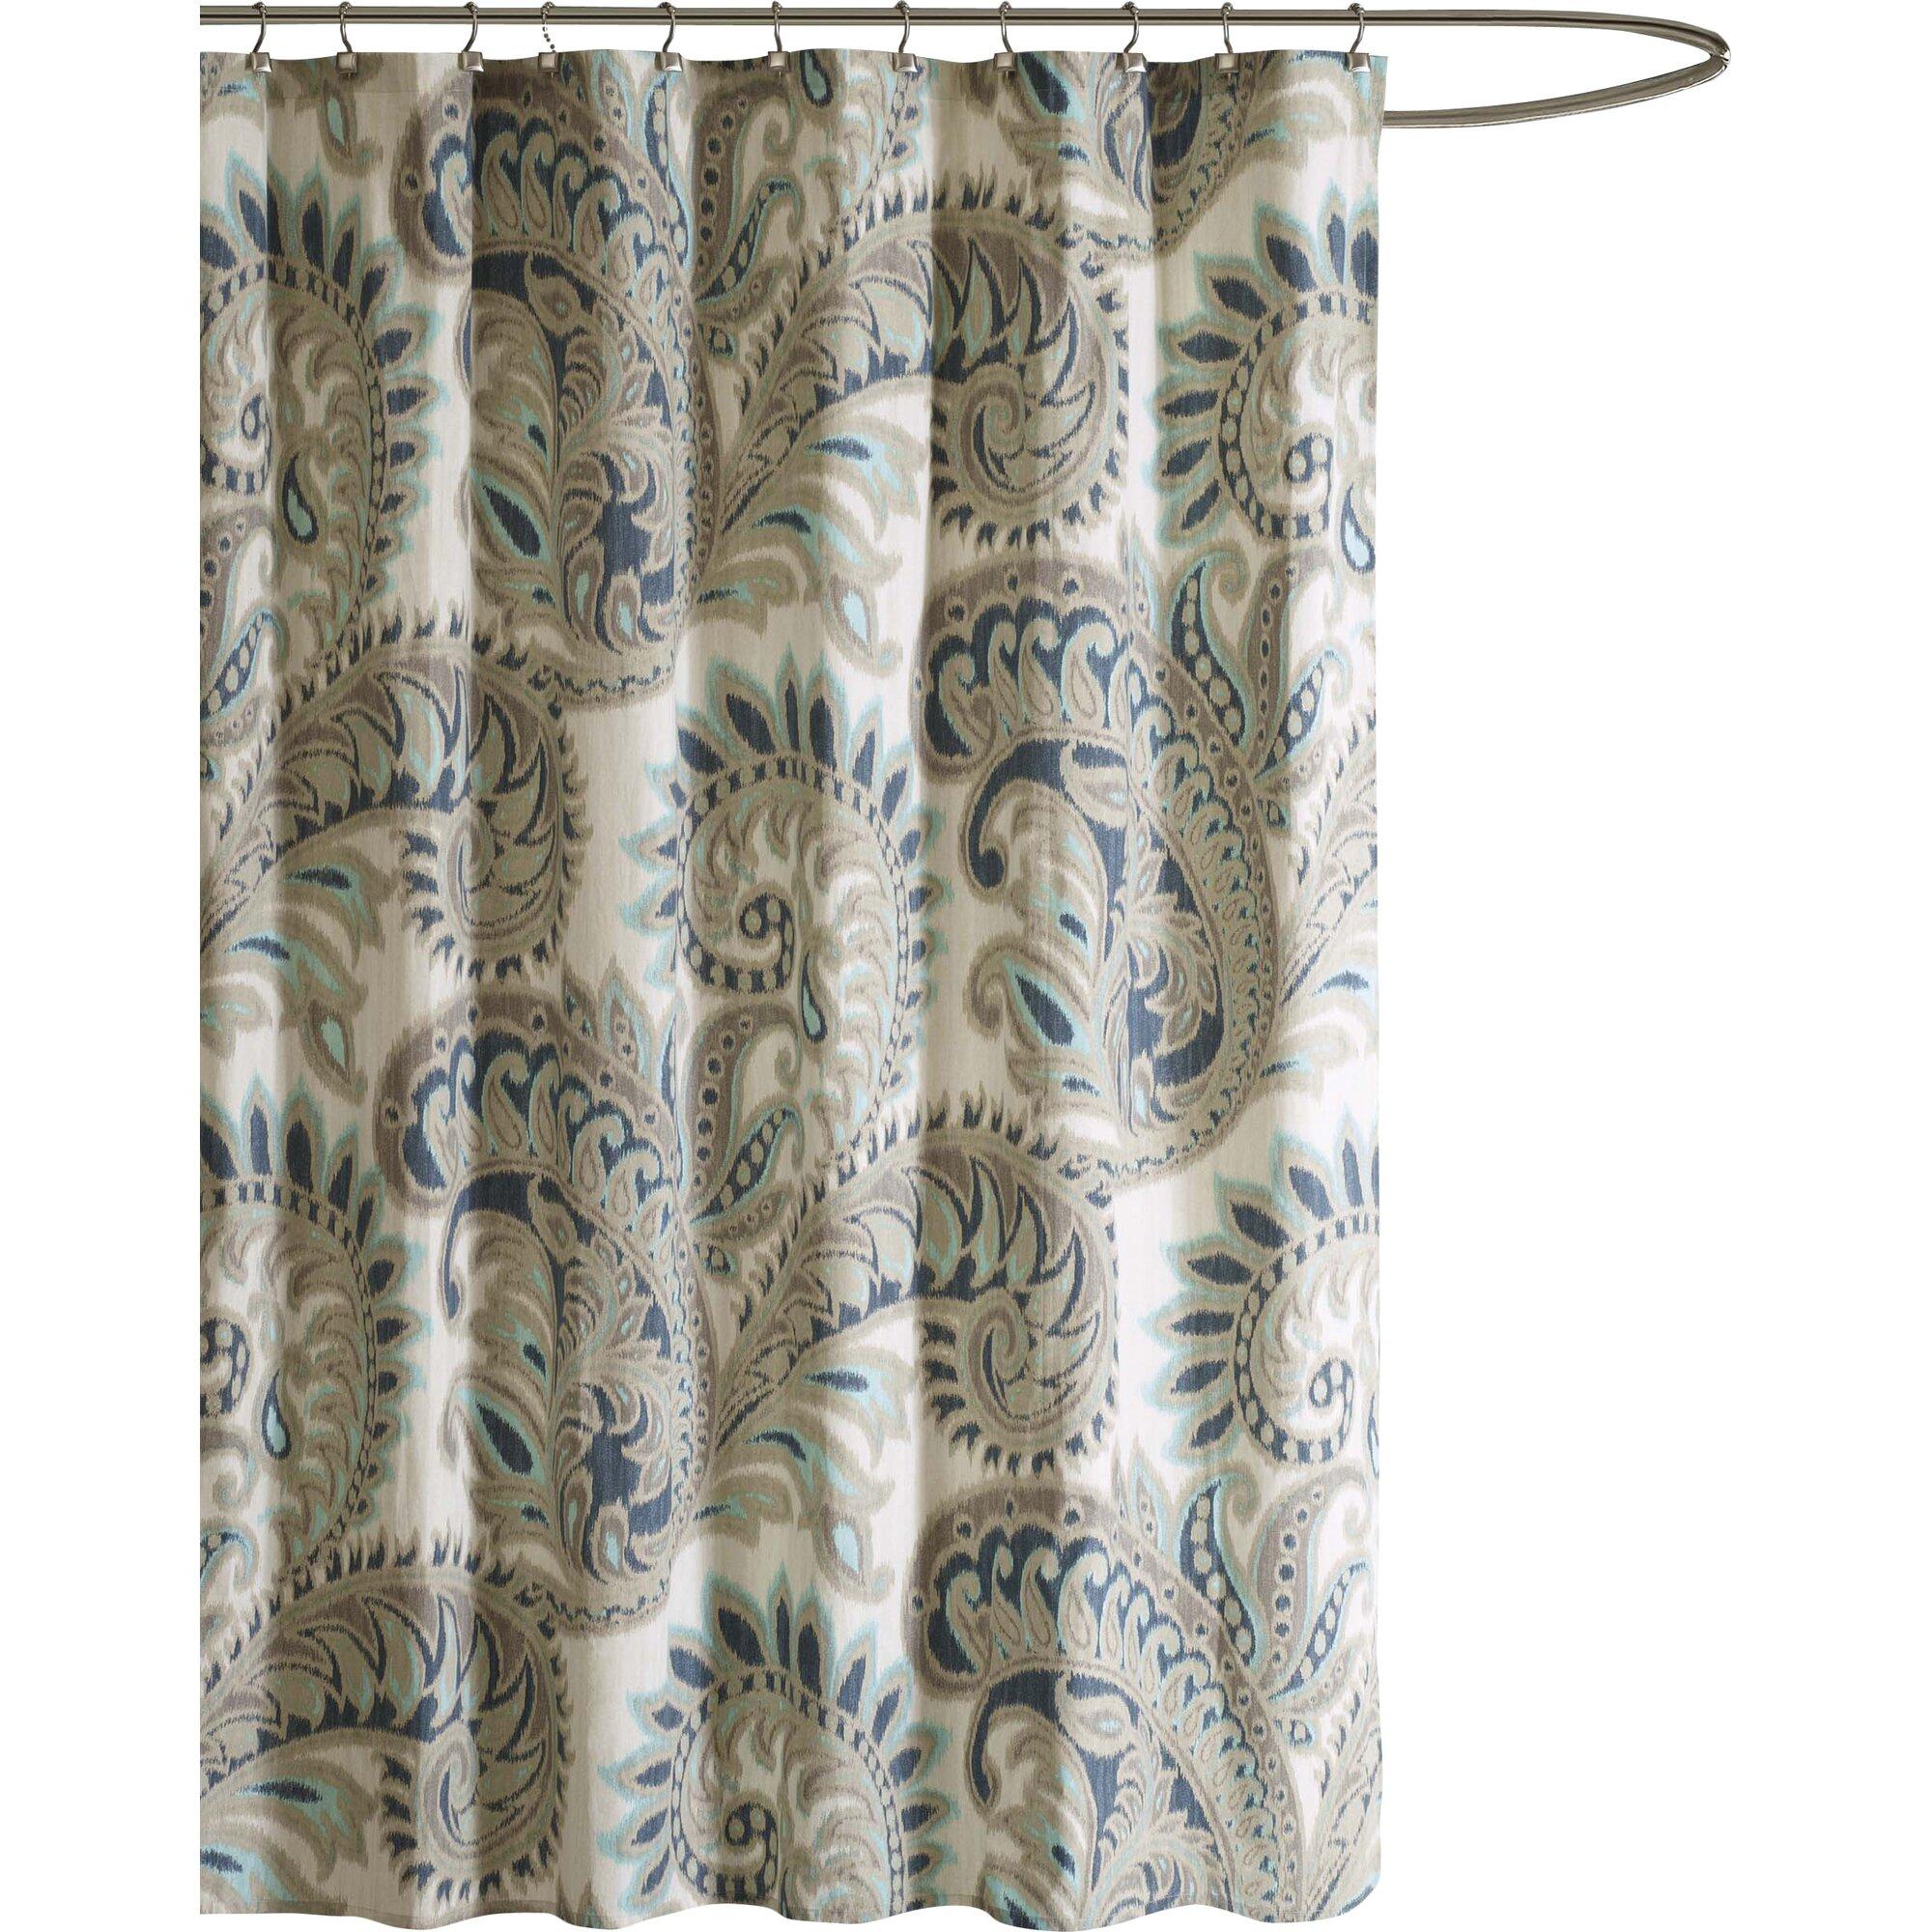 Thomas paul octopus shower curtain